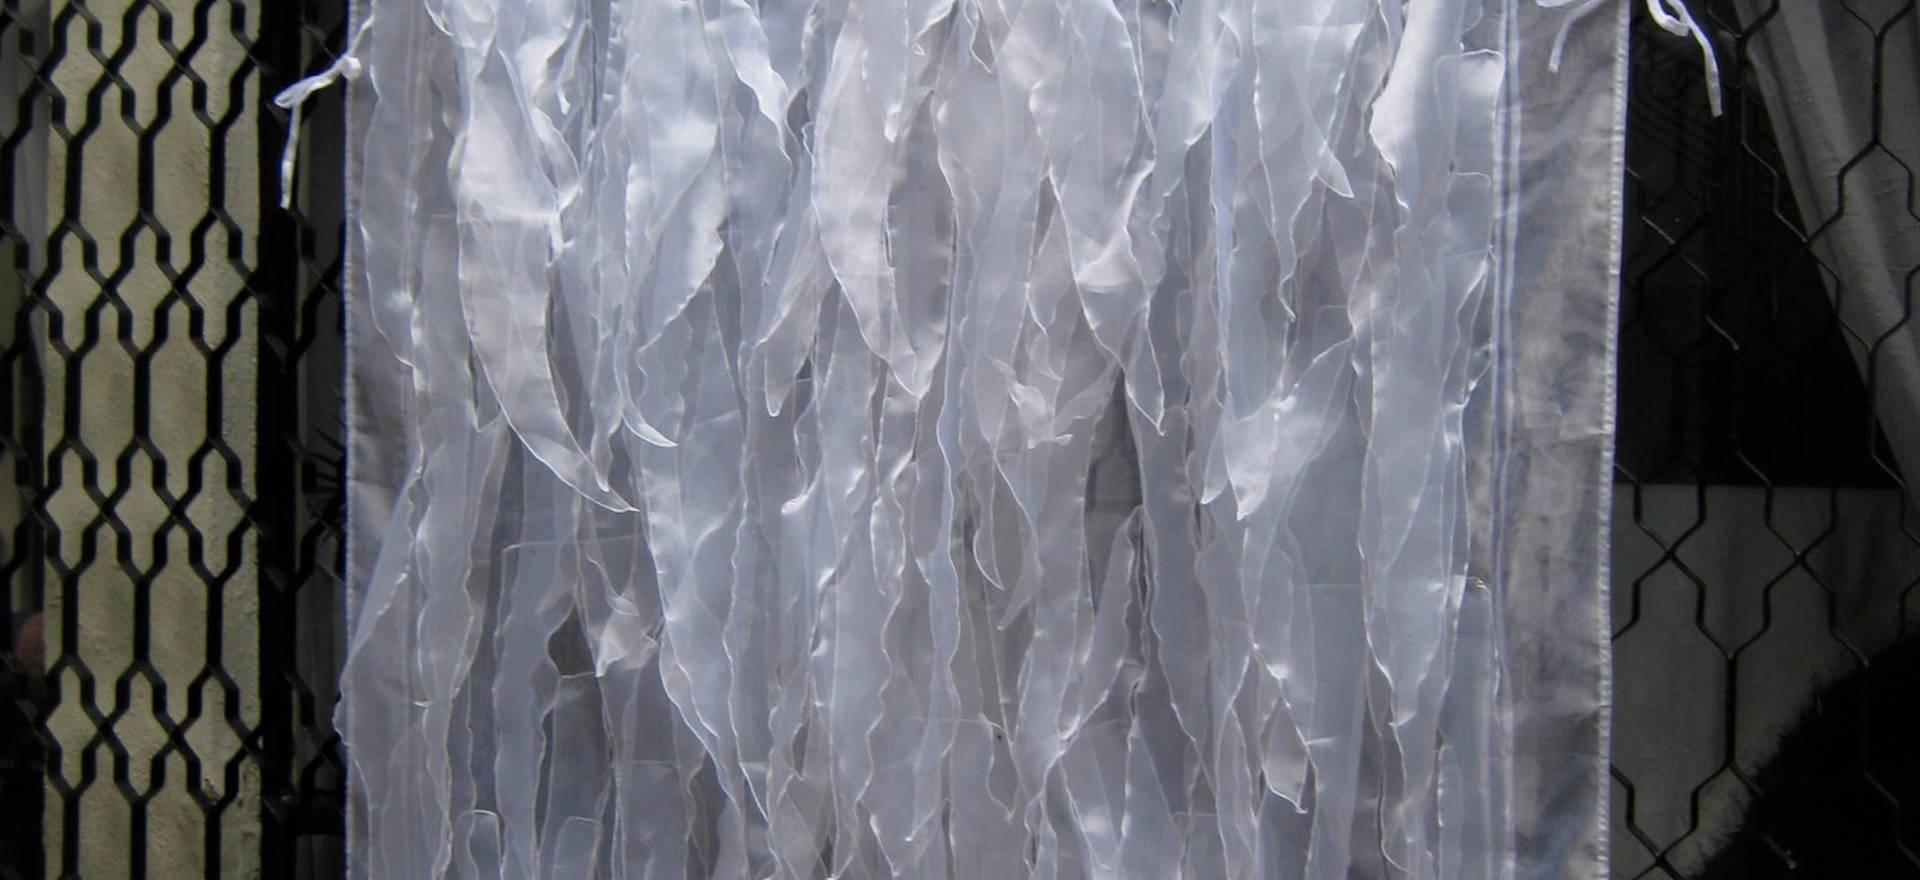 In the wind, 2011 Organza fabric. 94.48 x  64.17 inches. 240 x 163 cm.